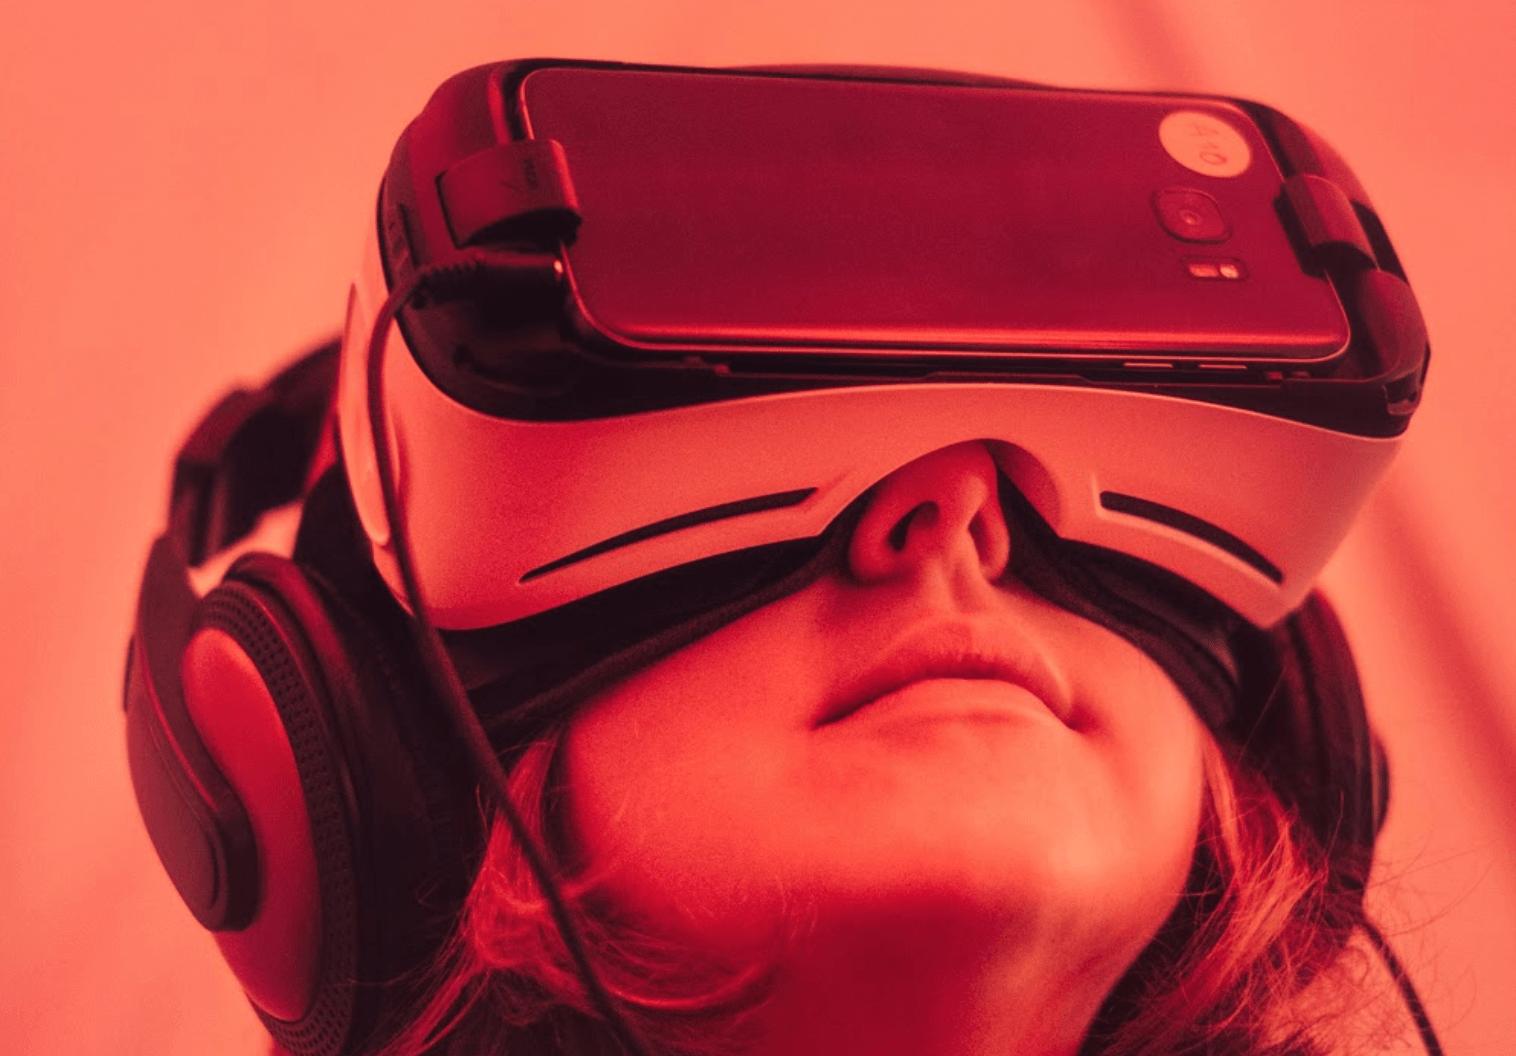 virtual_reality_vr_support_representative